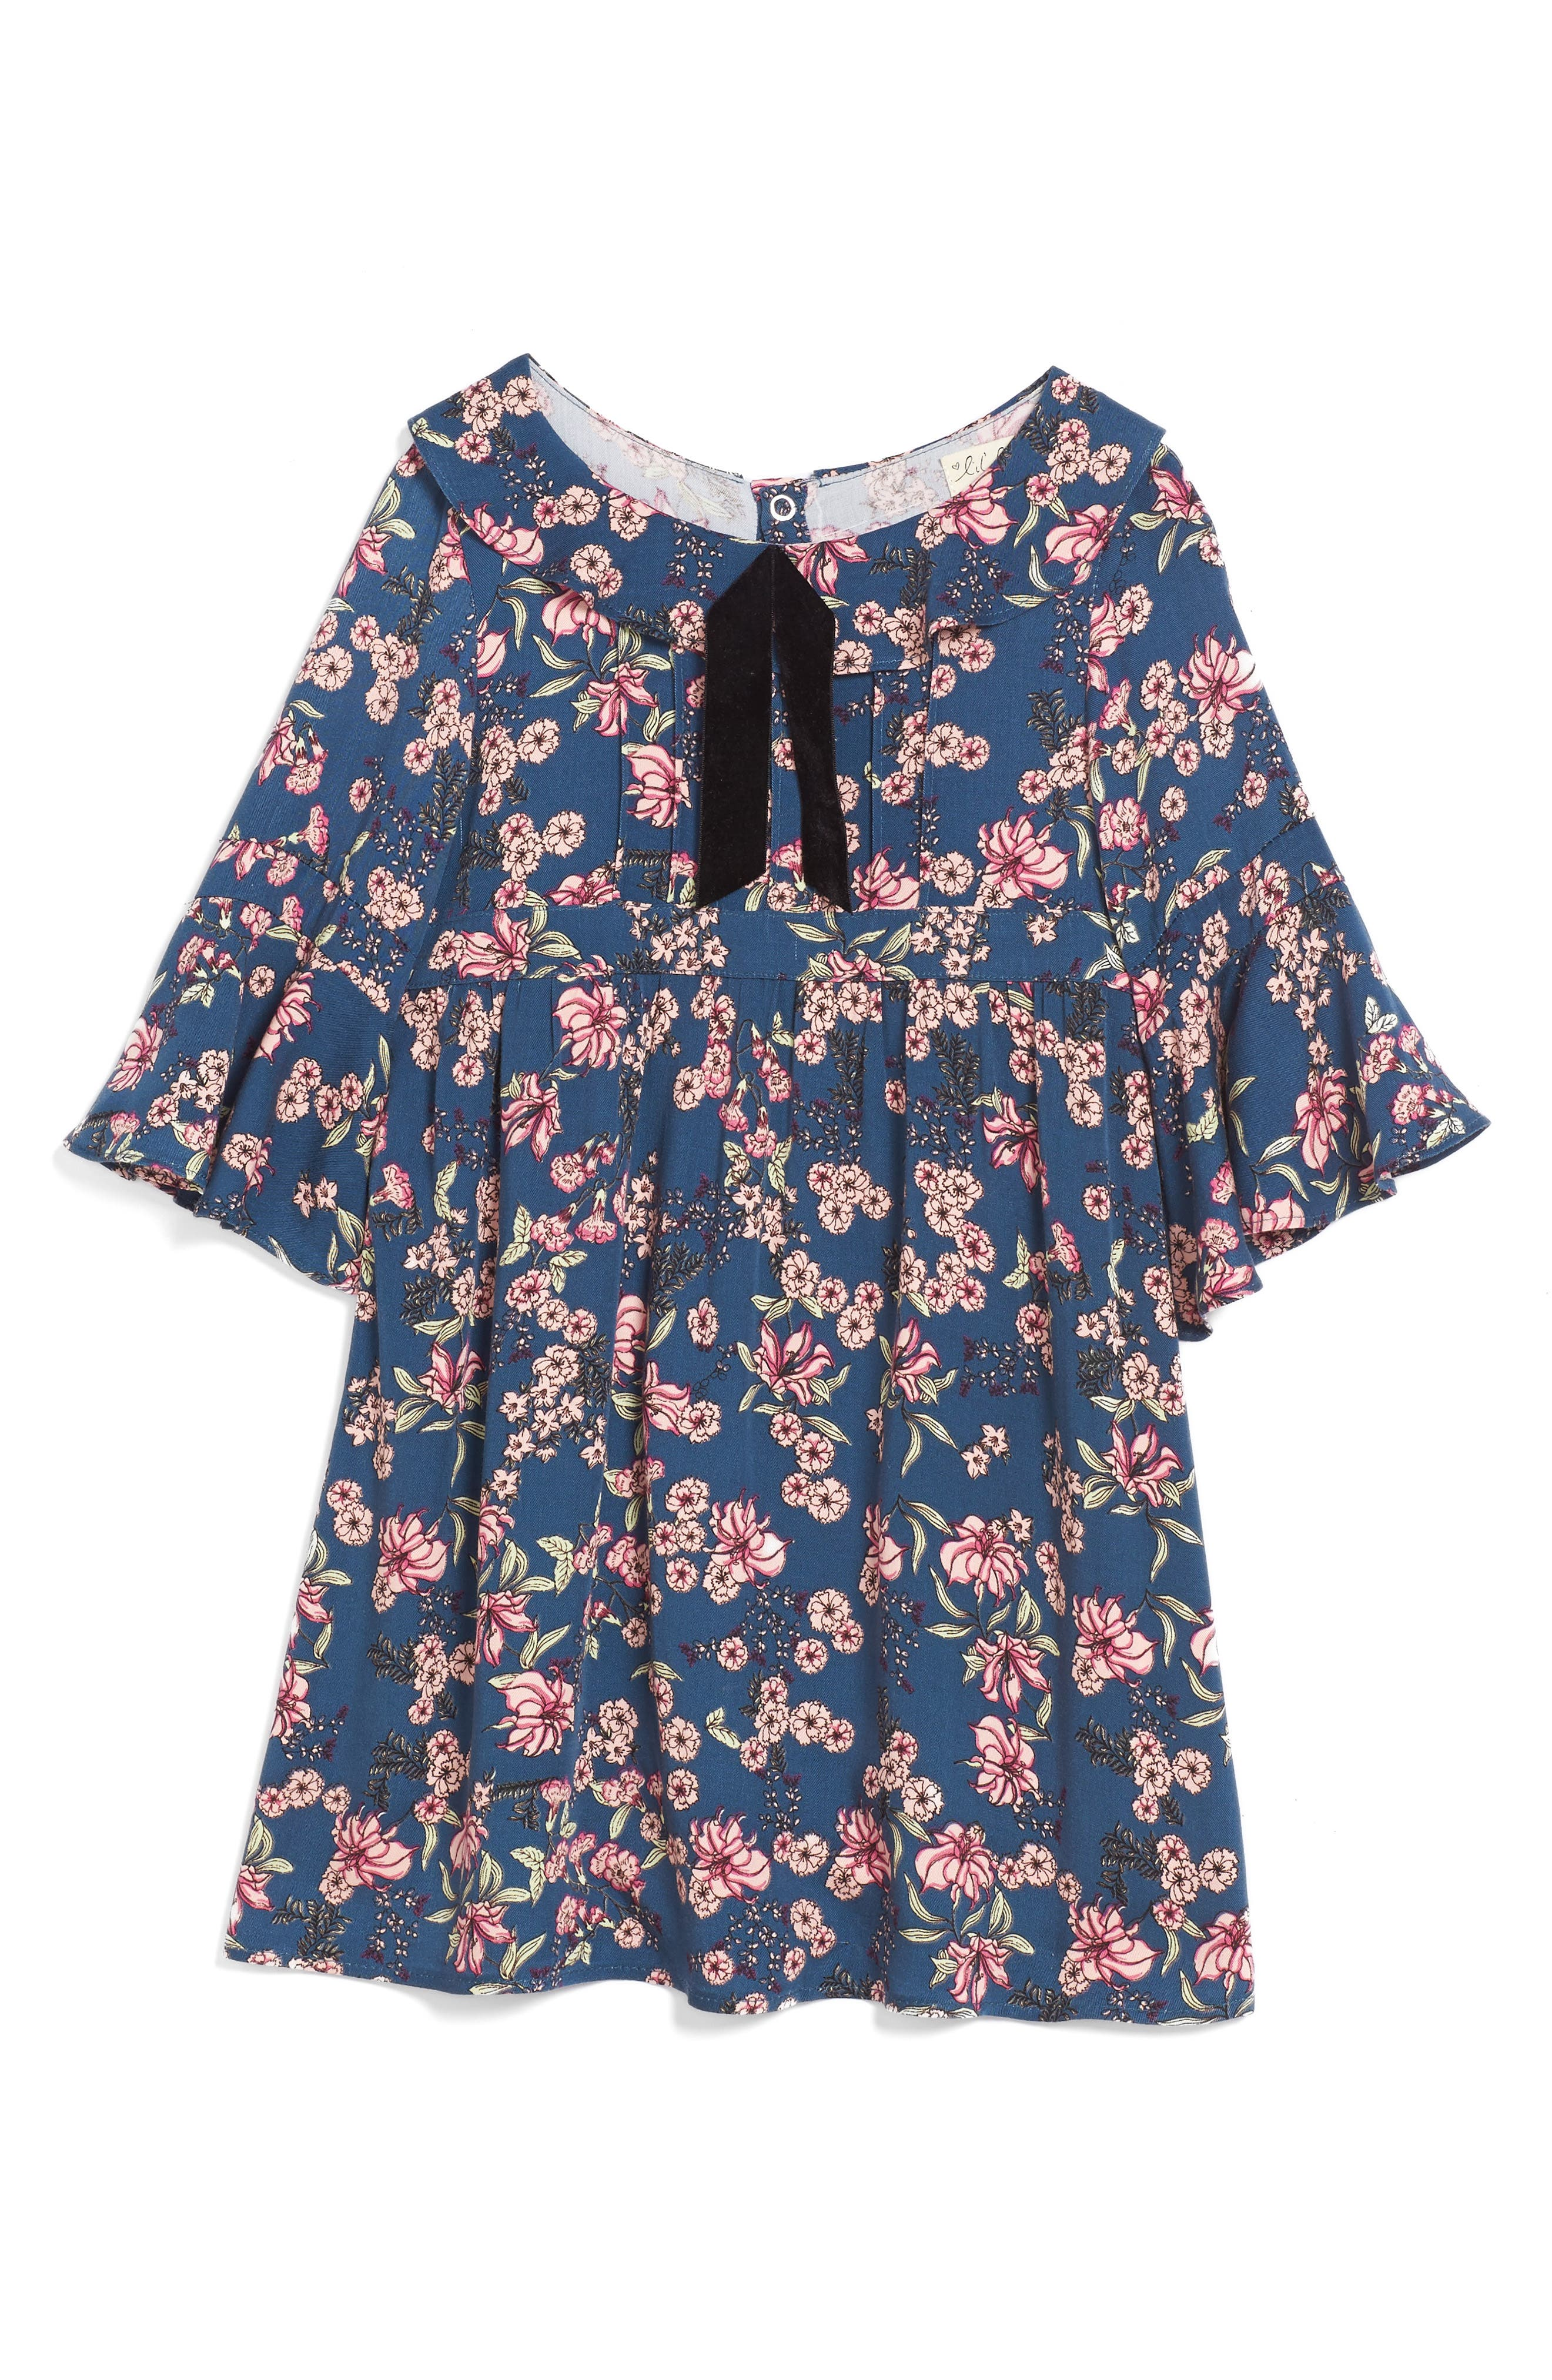 For Love & Lemons Juniper Floral Bell Sleeve Dress,                         Main,                         color, 410